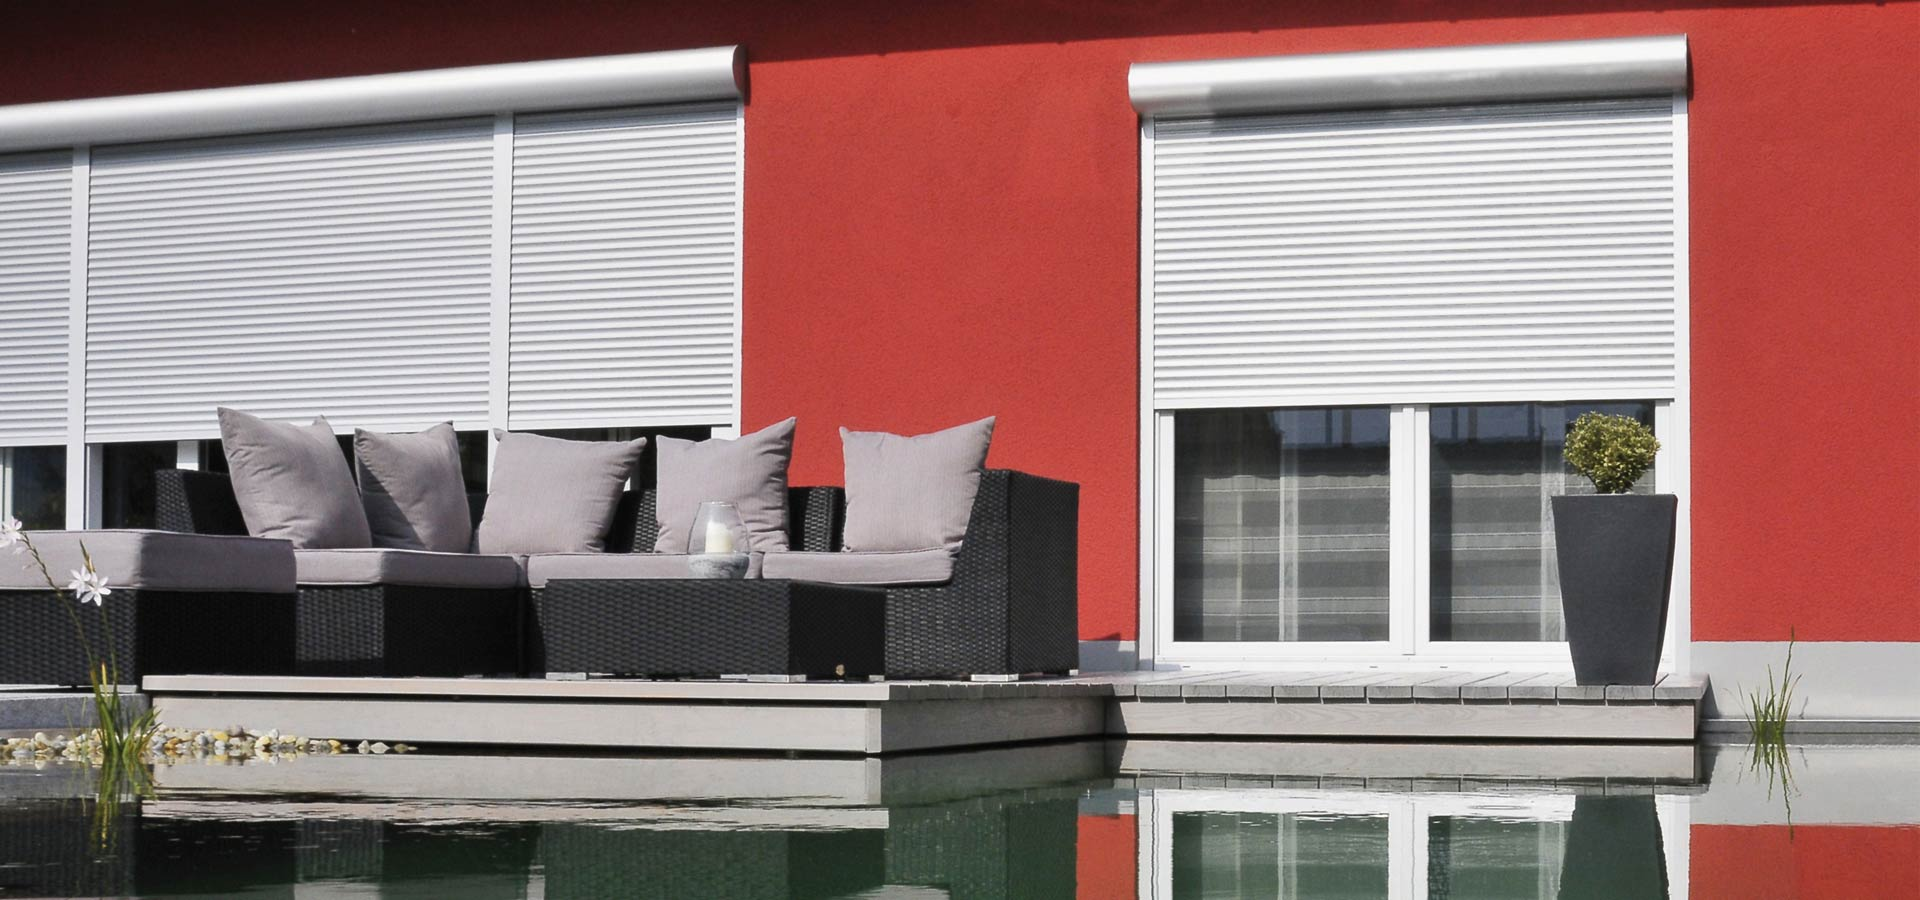 Rolll den sonpro l ndle sonnenschutz - Sonnenschutz giebelfenster ...